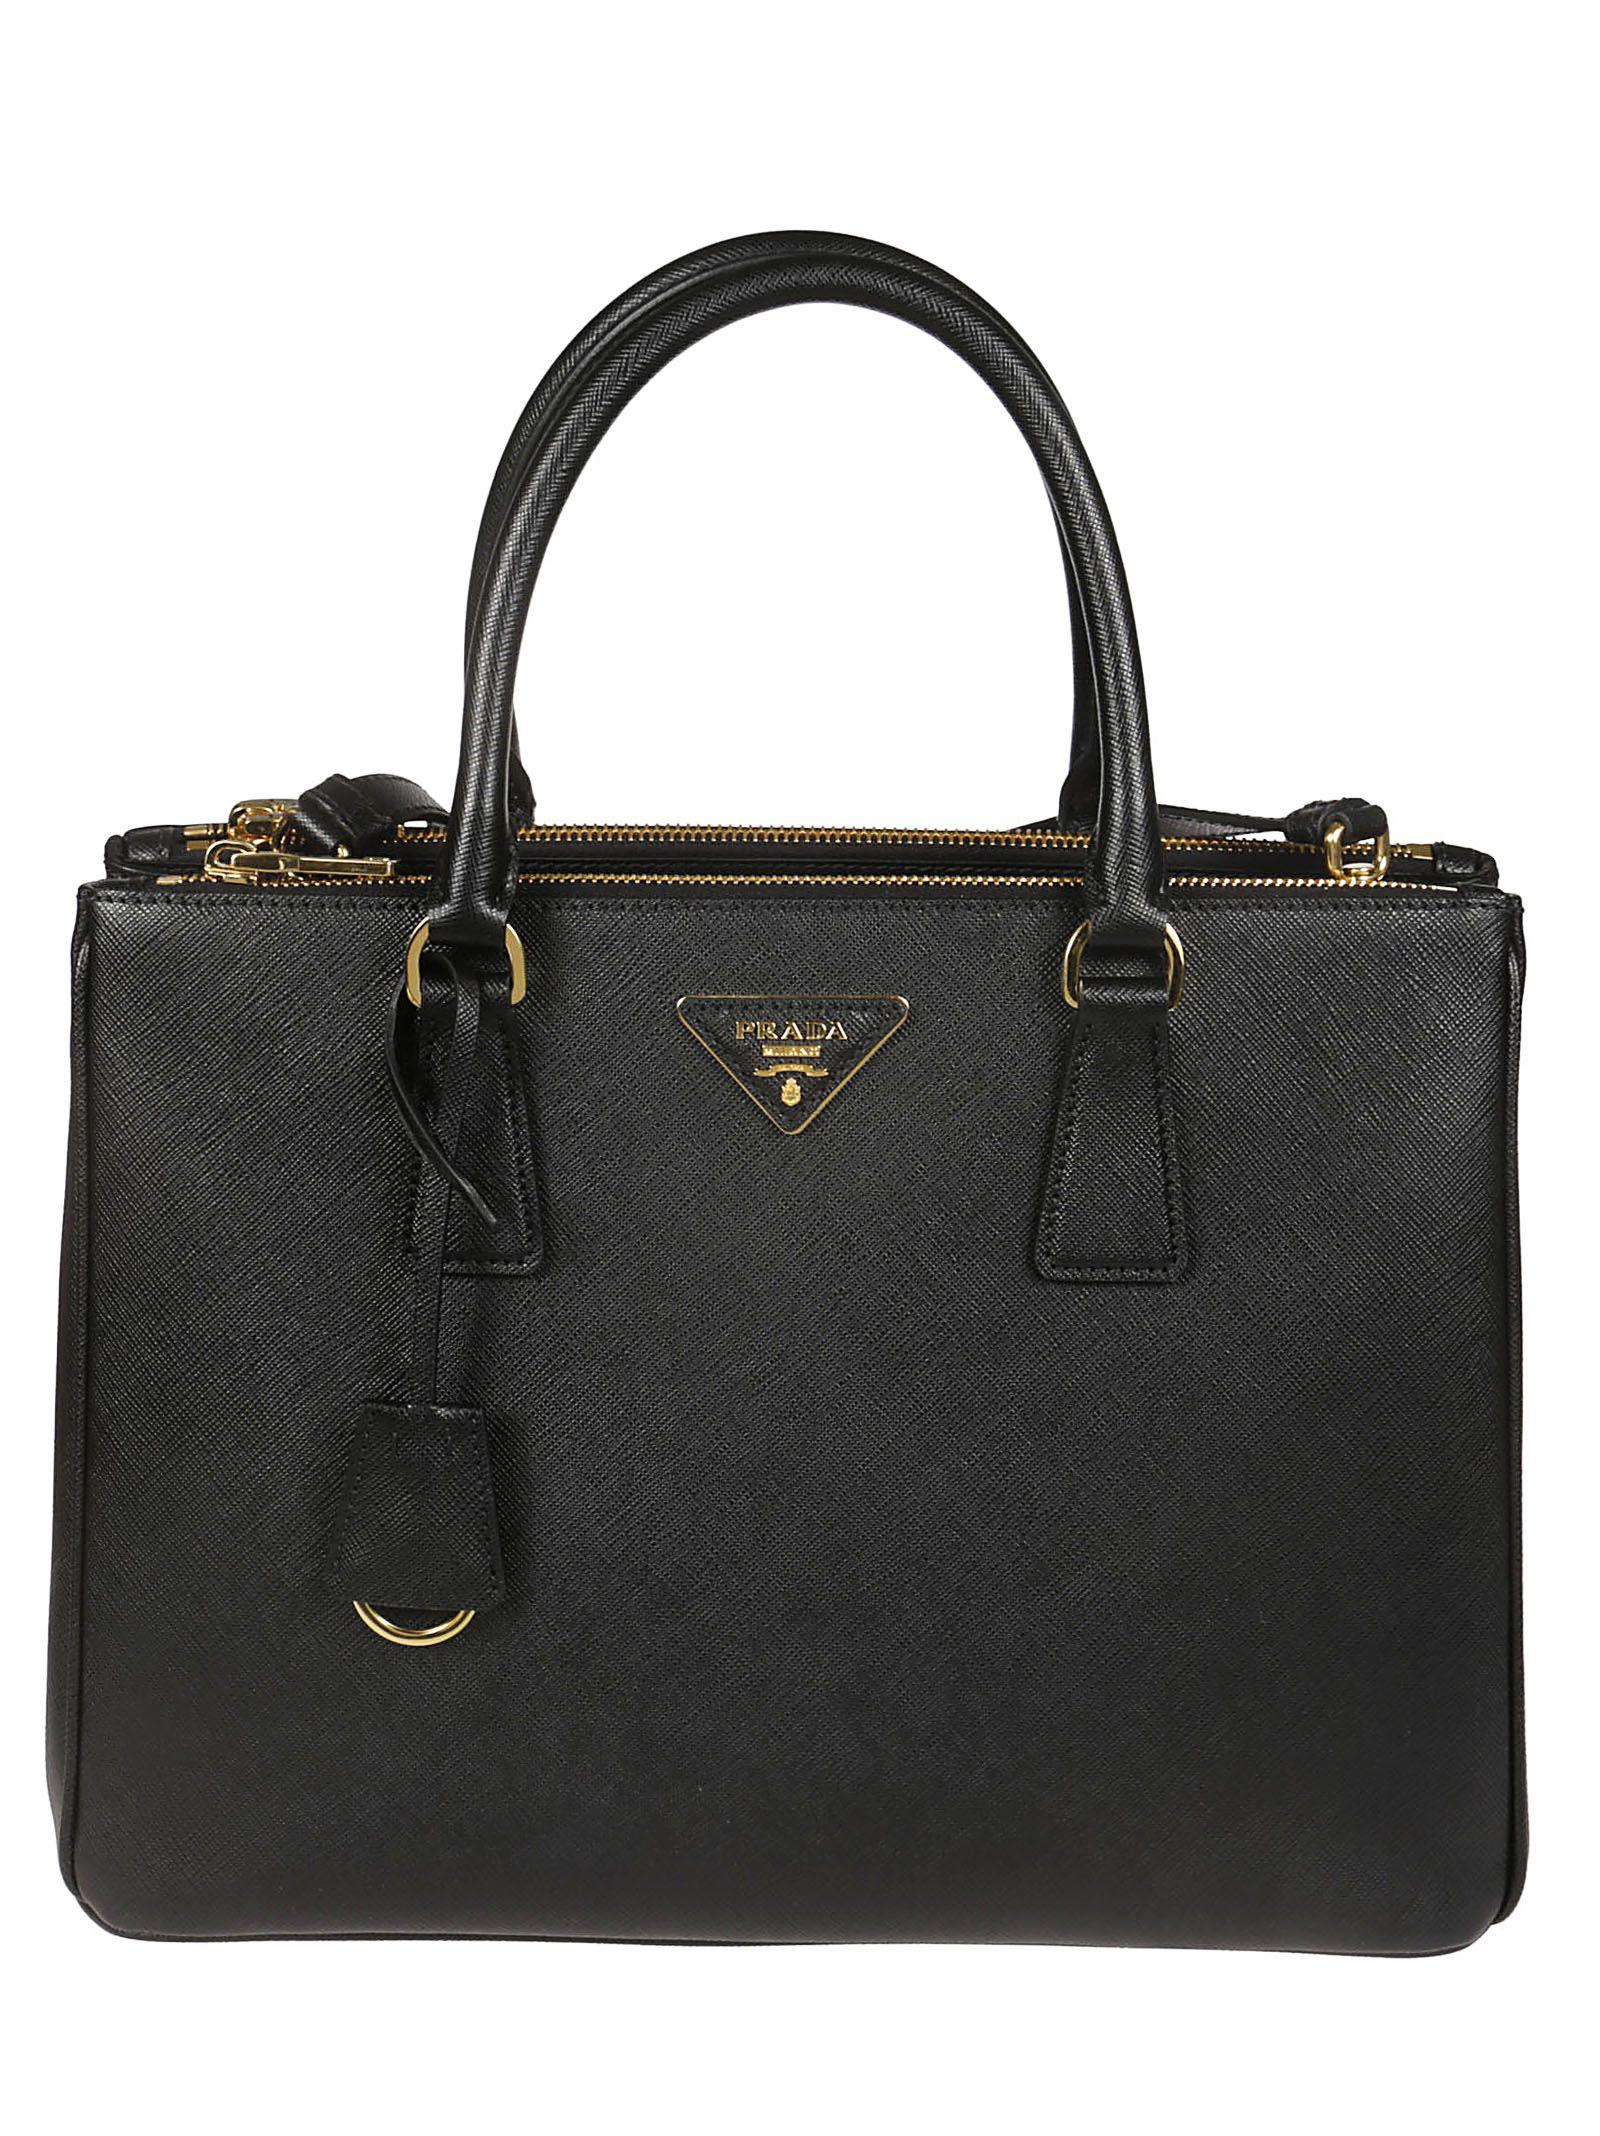 0b8fe6d69010 Prada Classic Boxy Tote In Black